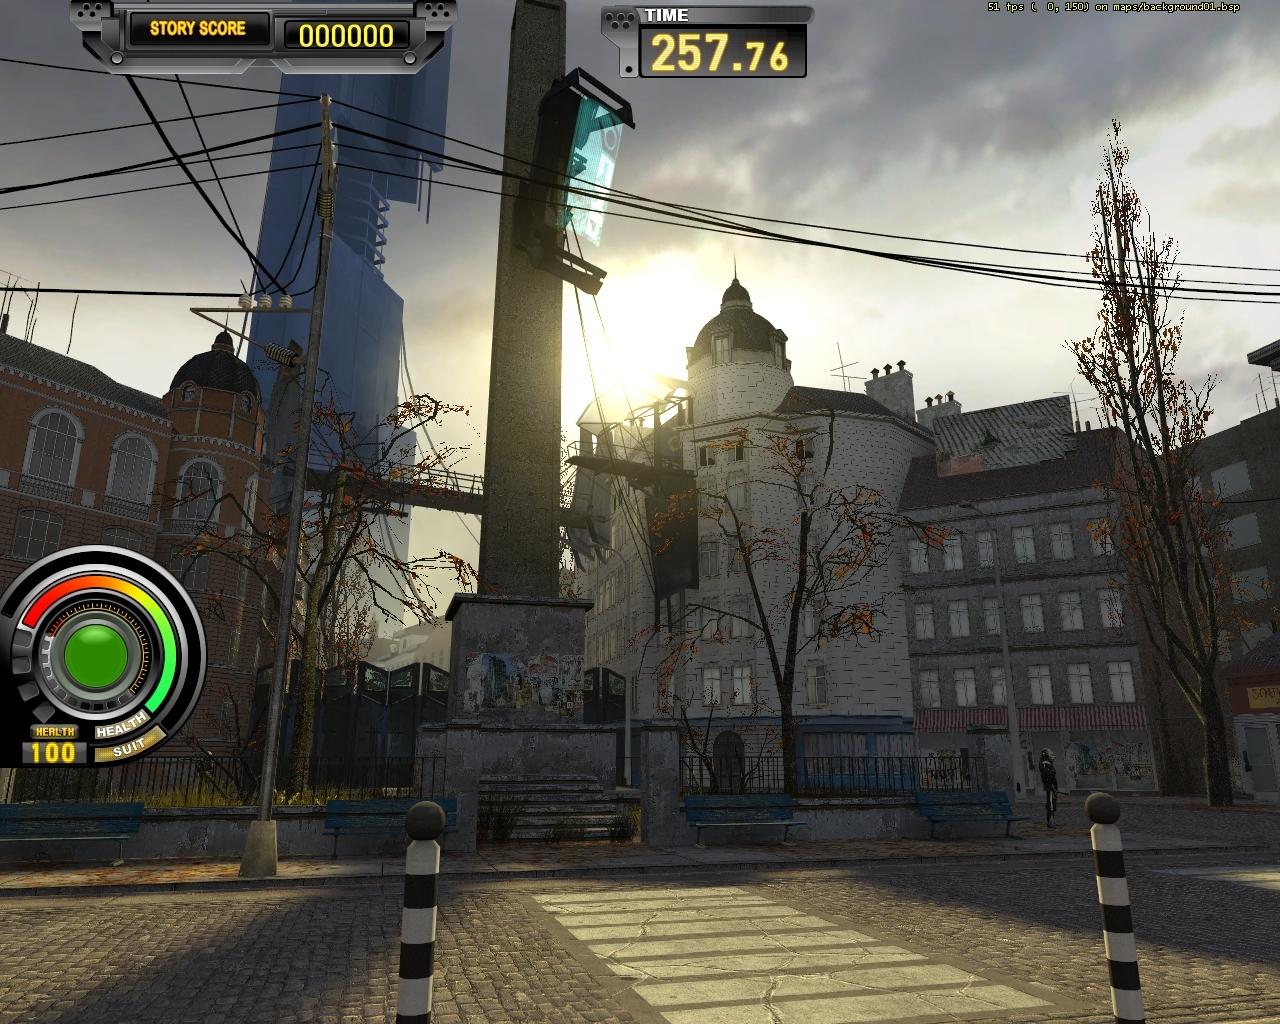 mat_mipmaptextures 0 - Half-Life 2 Half-Life 2 Survivor, HL2Survivor